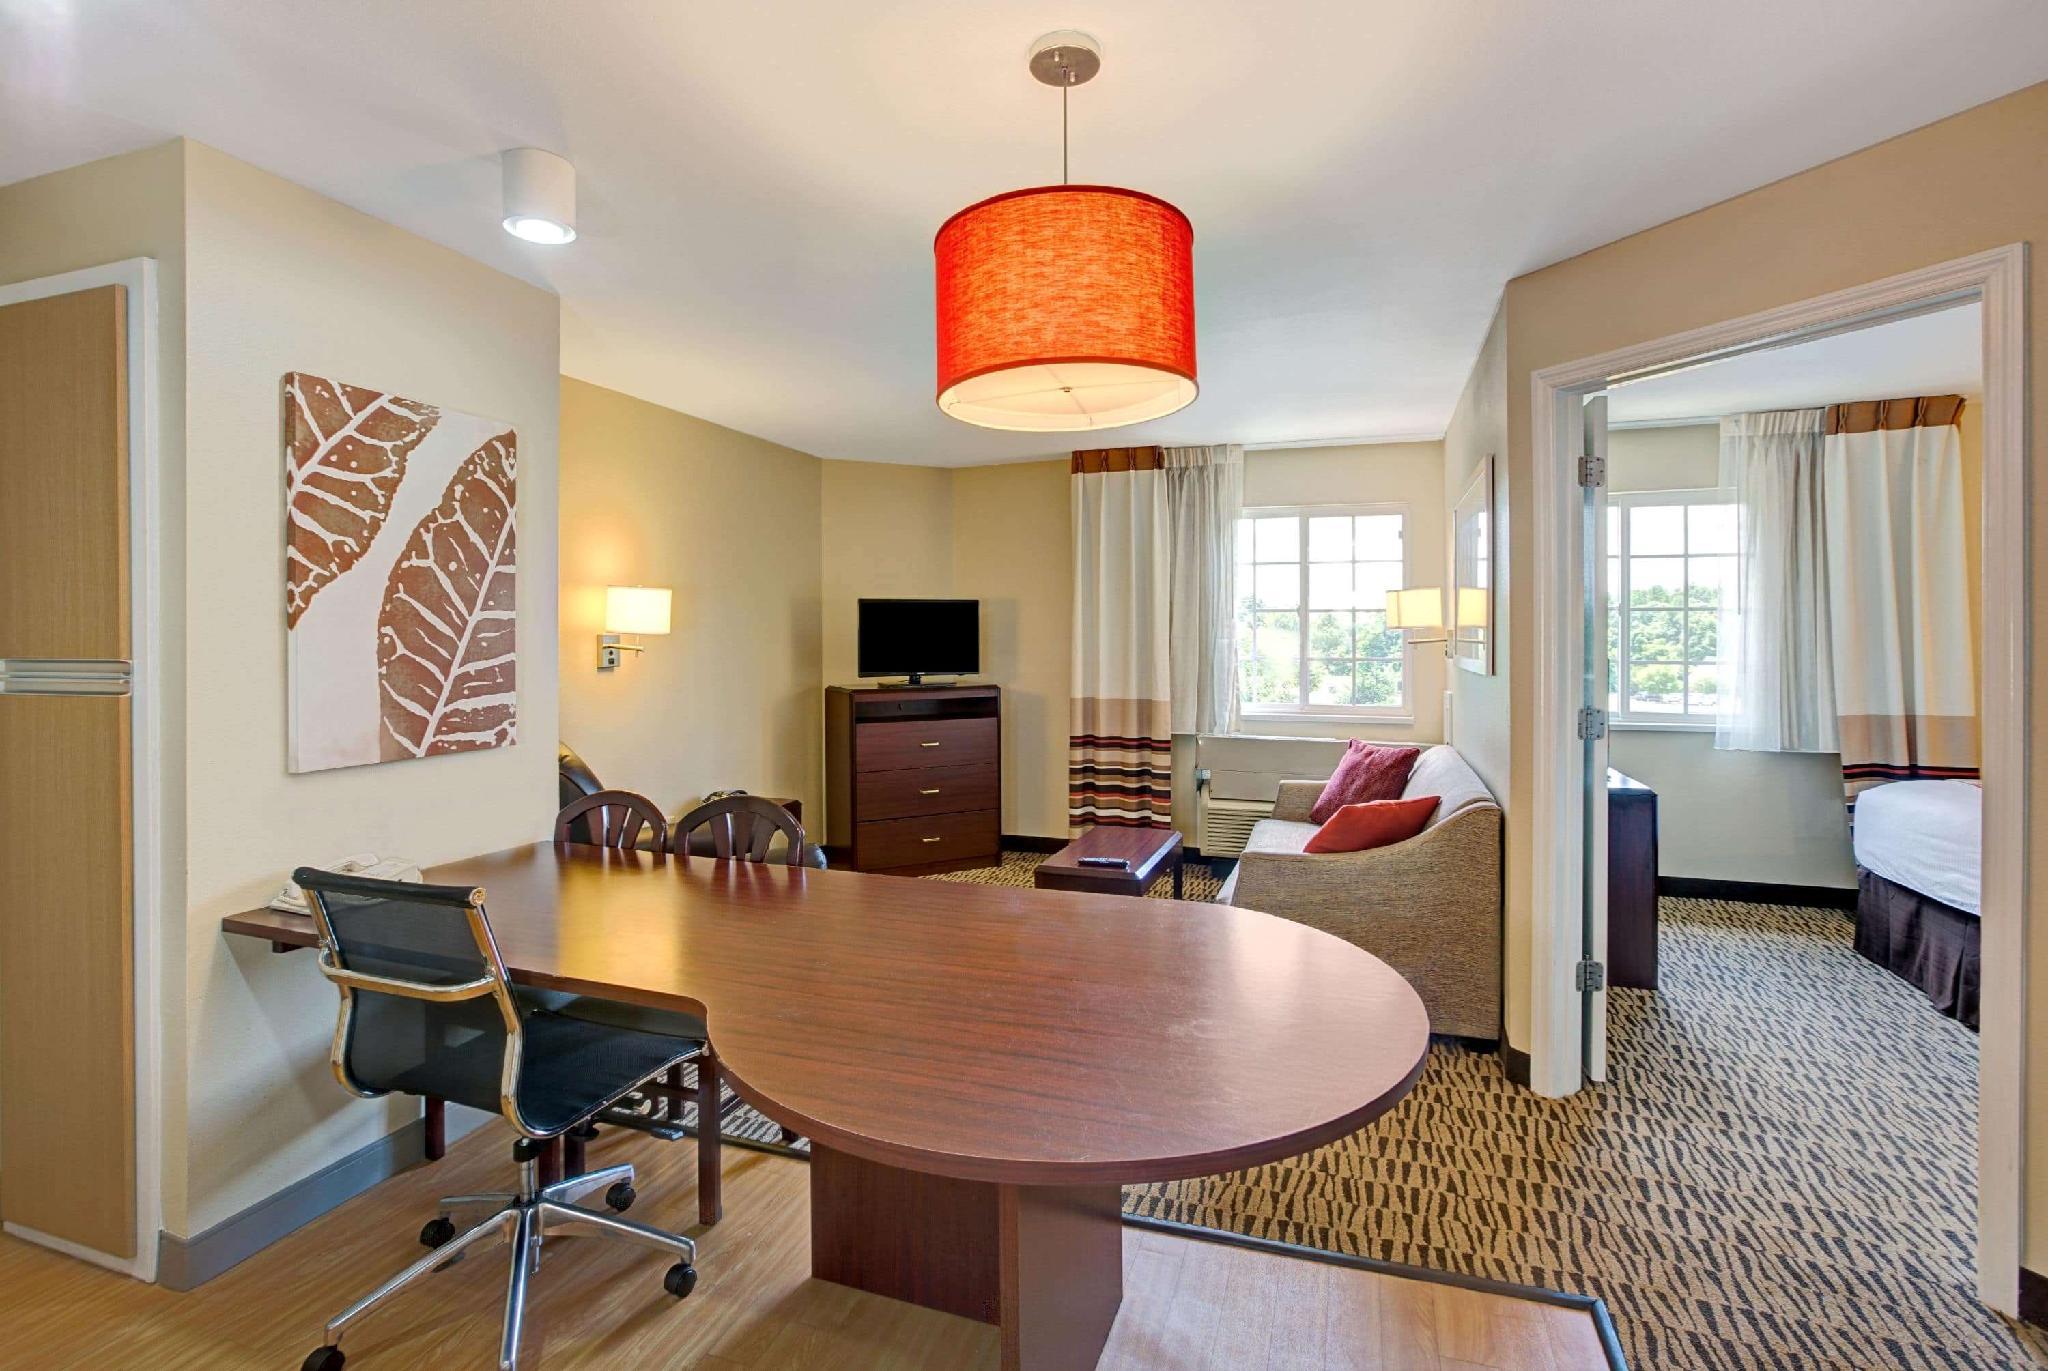 Hawthorn Suites By Wyndham Greensboro / Best Hotels In Greensboro NC